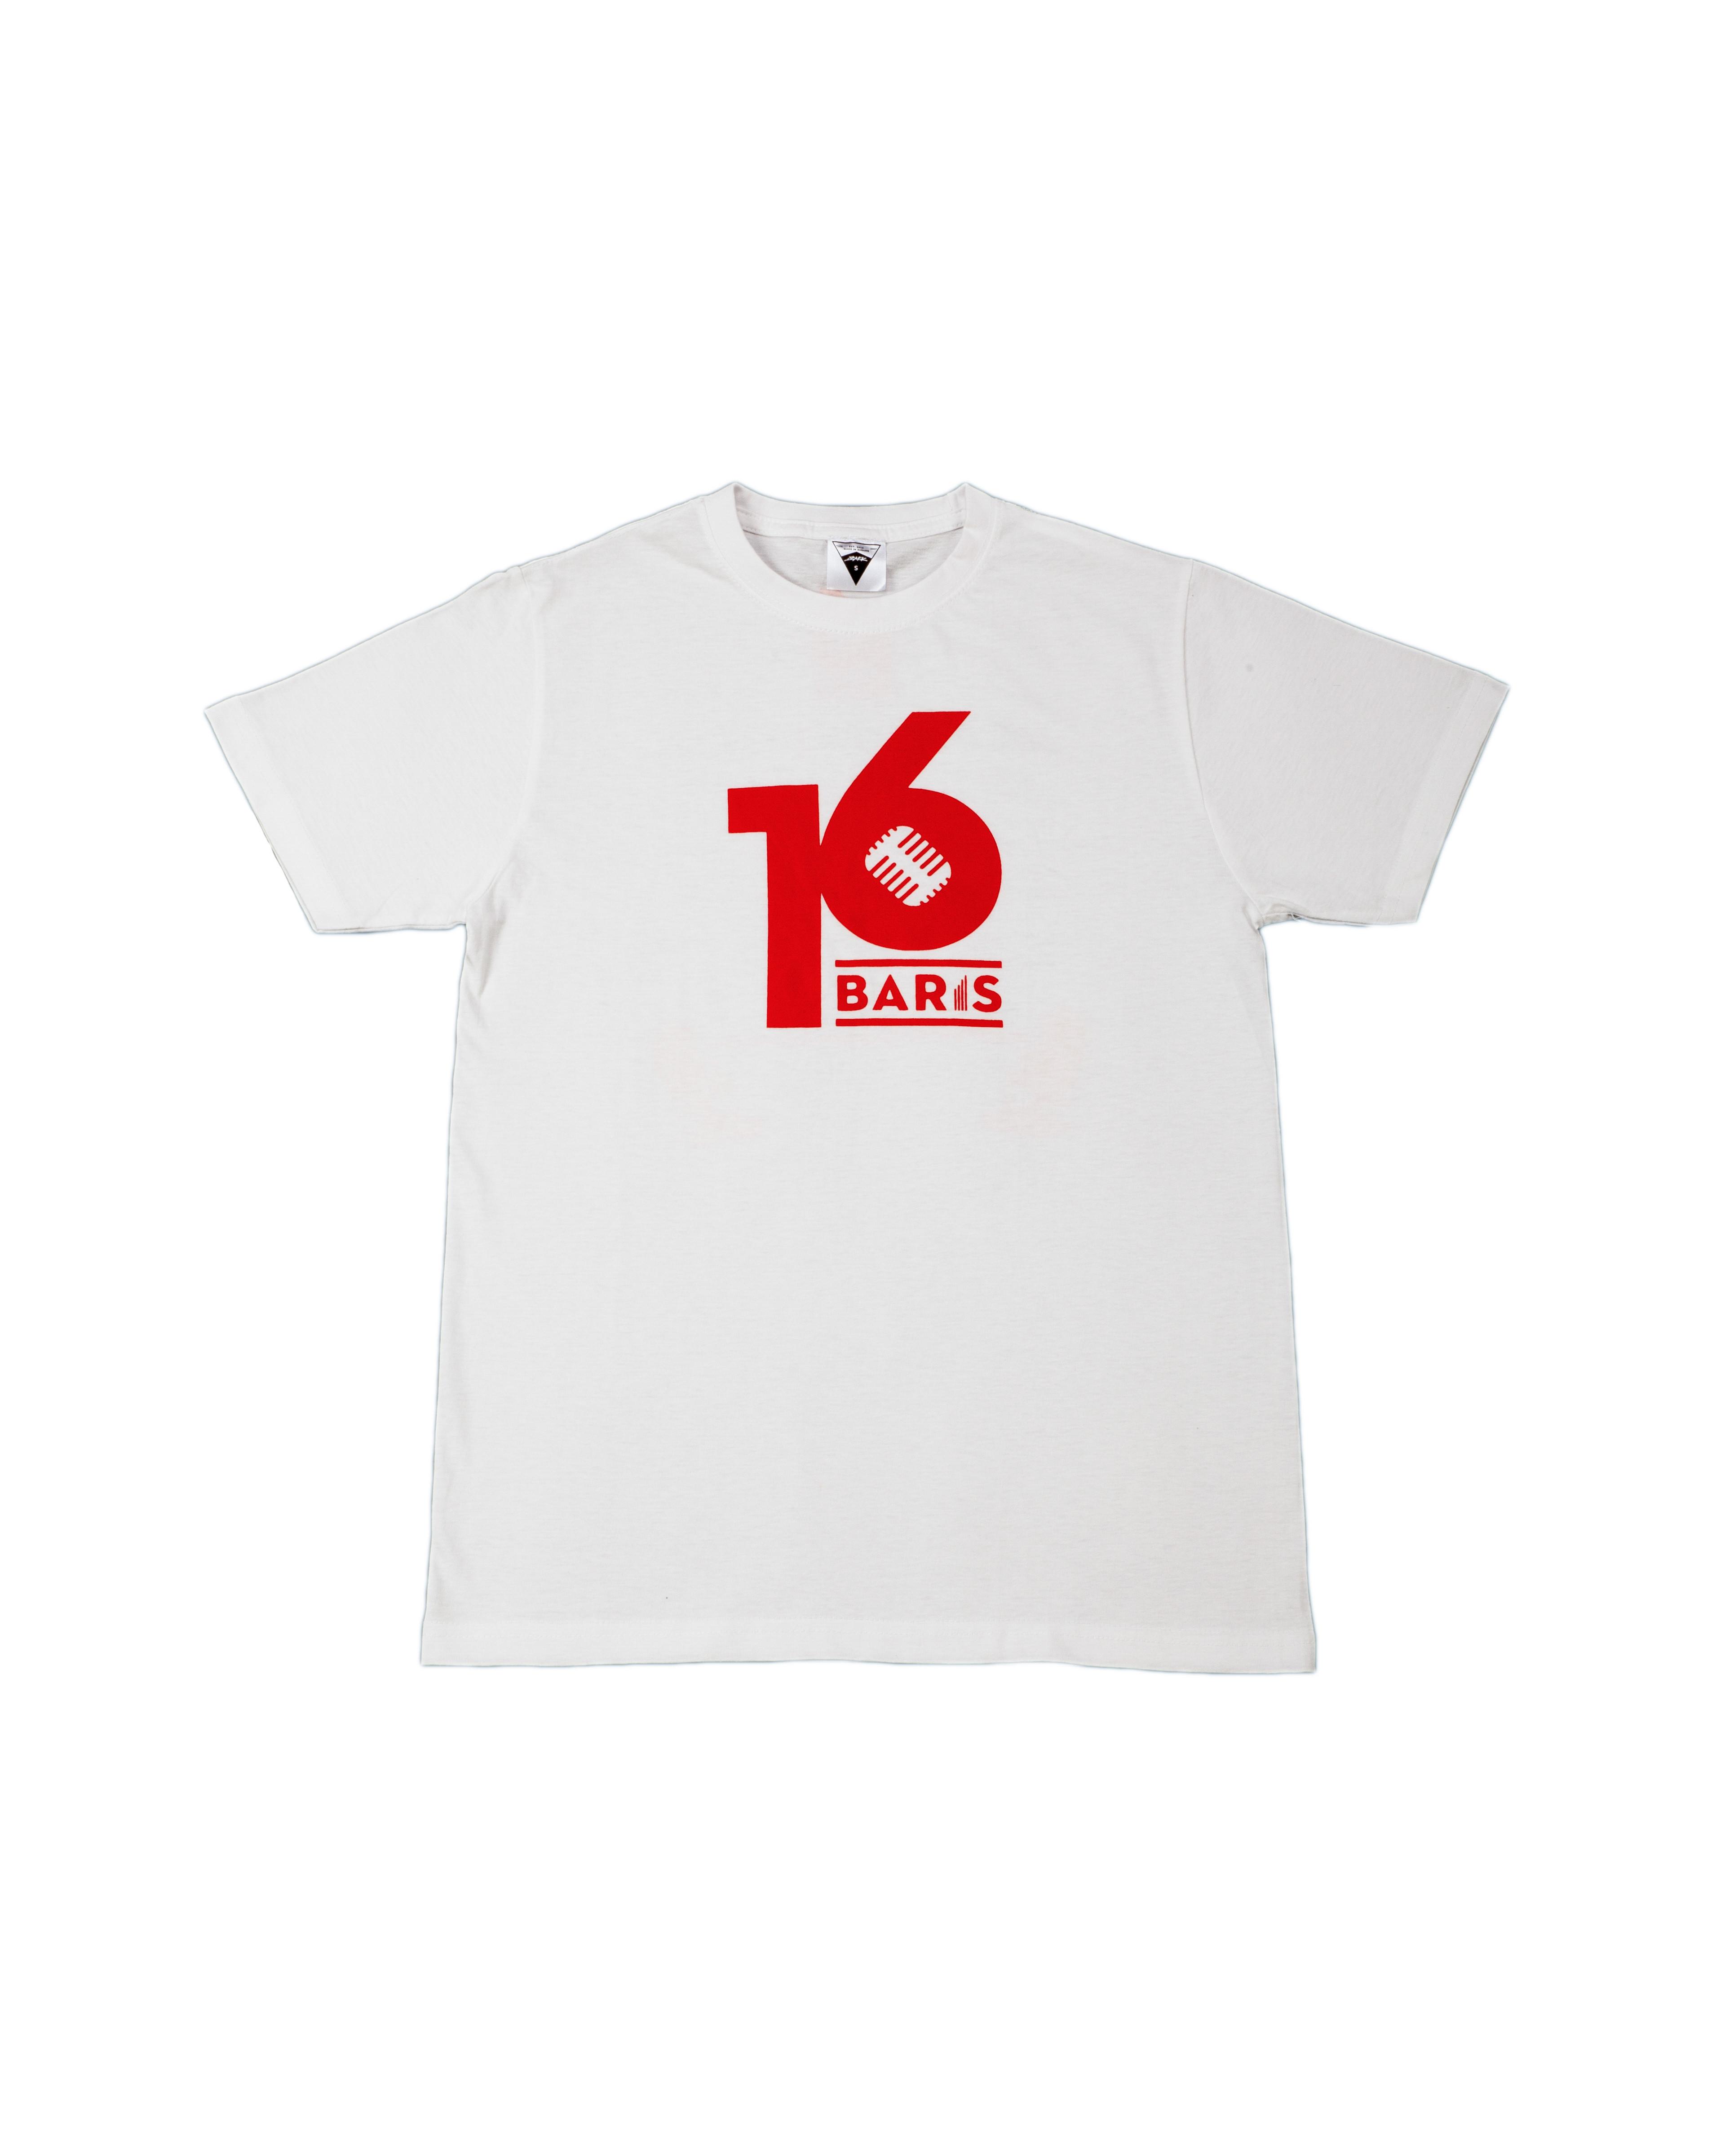 16 BARIS TEE - WHITE